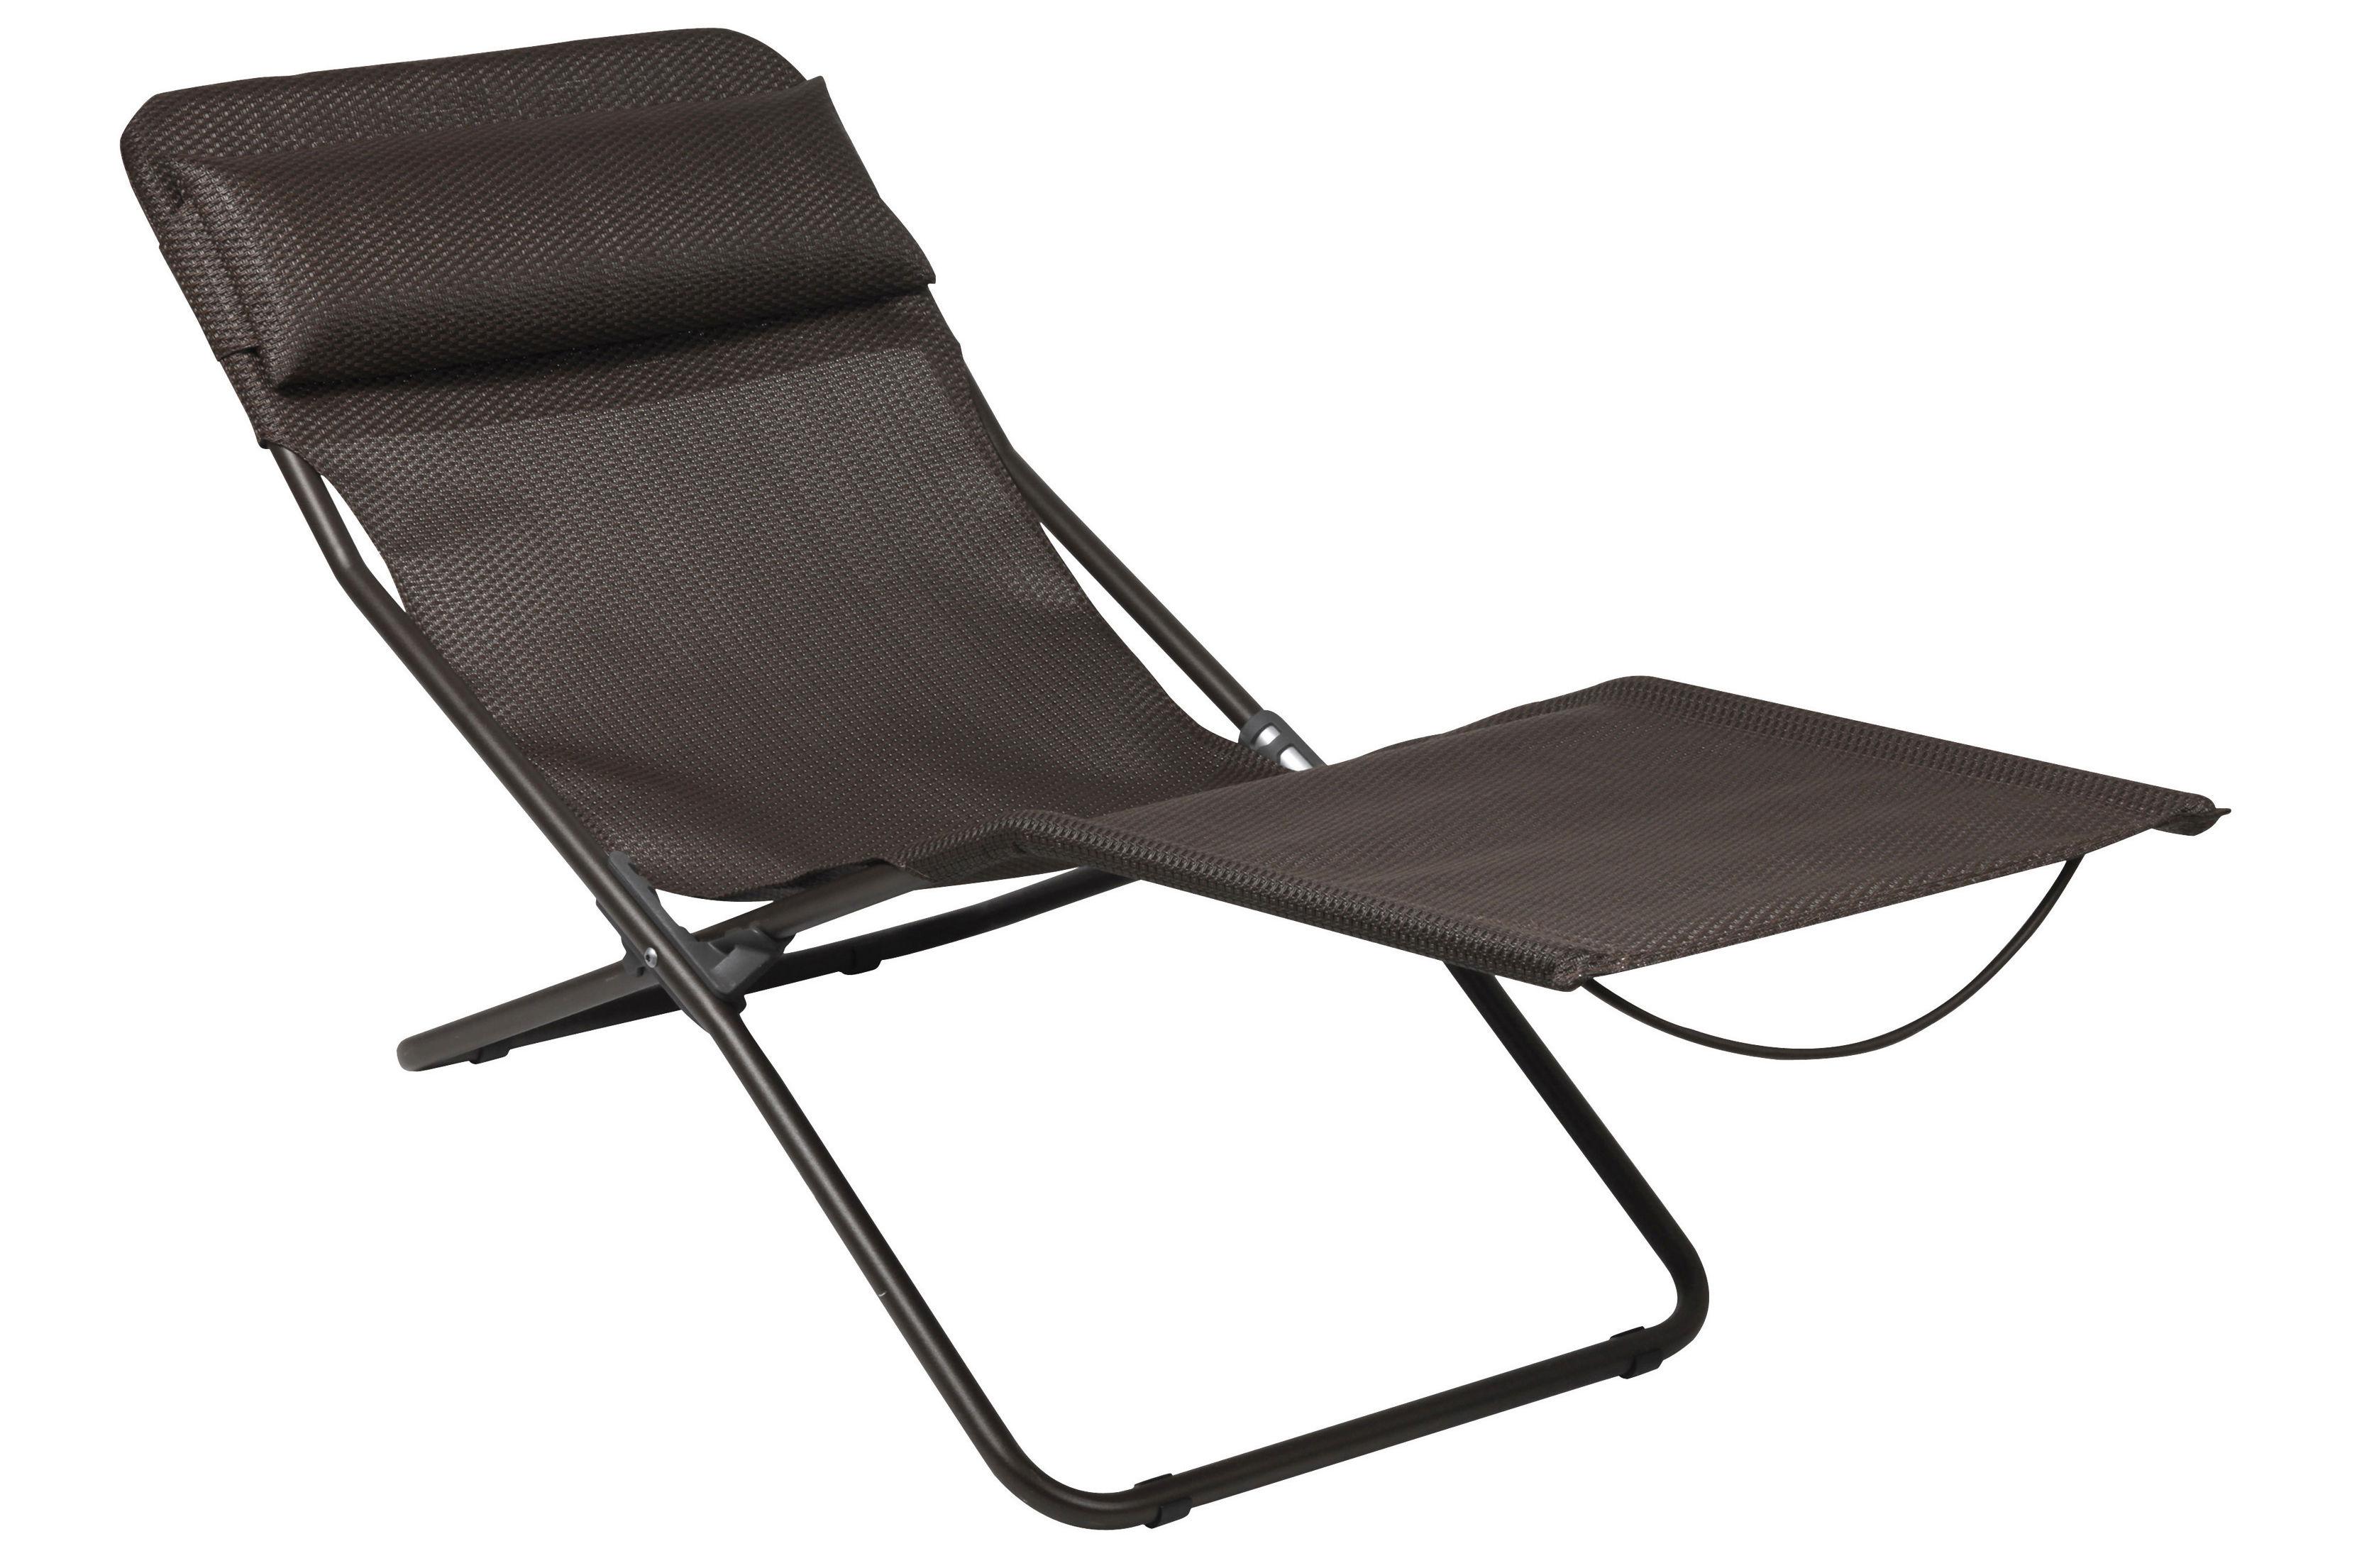 lafuma pop up chairs infant bath chair transalounge xl plus sun lounger foldable moka by